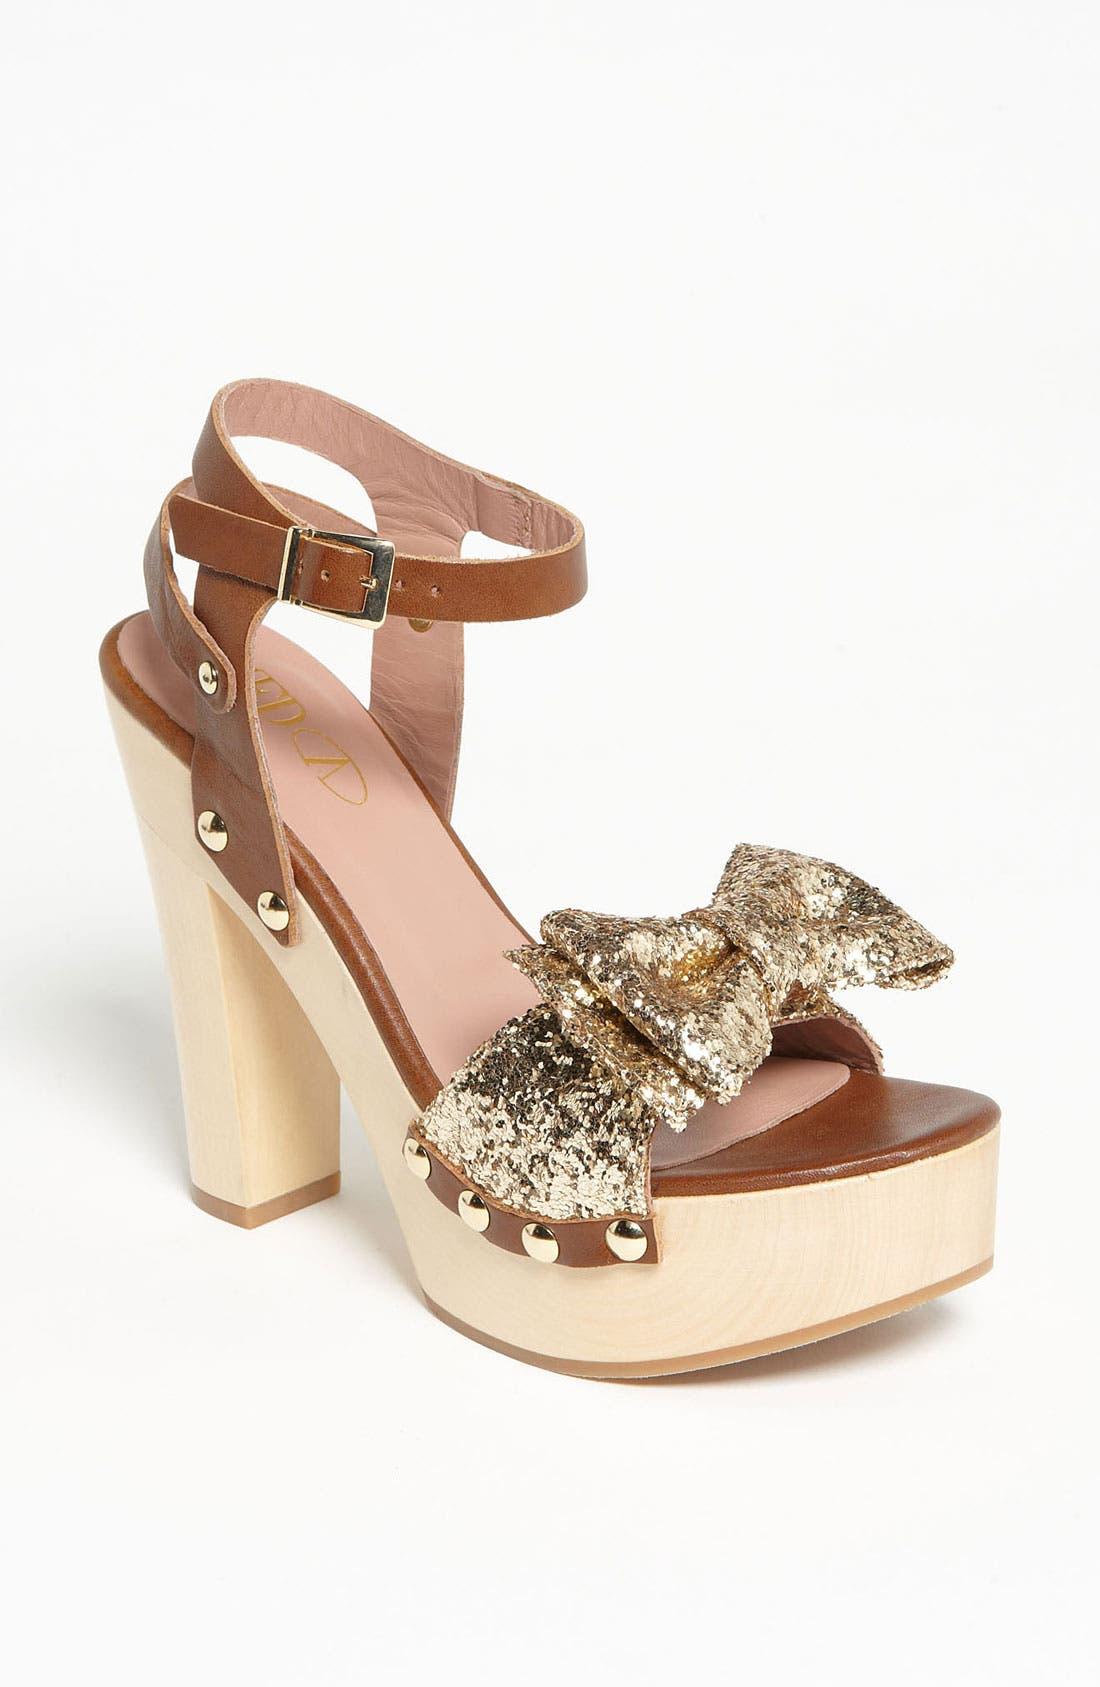 Main Image - RED Valentino Gold Glitter Sandal